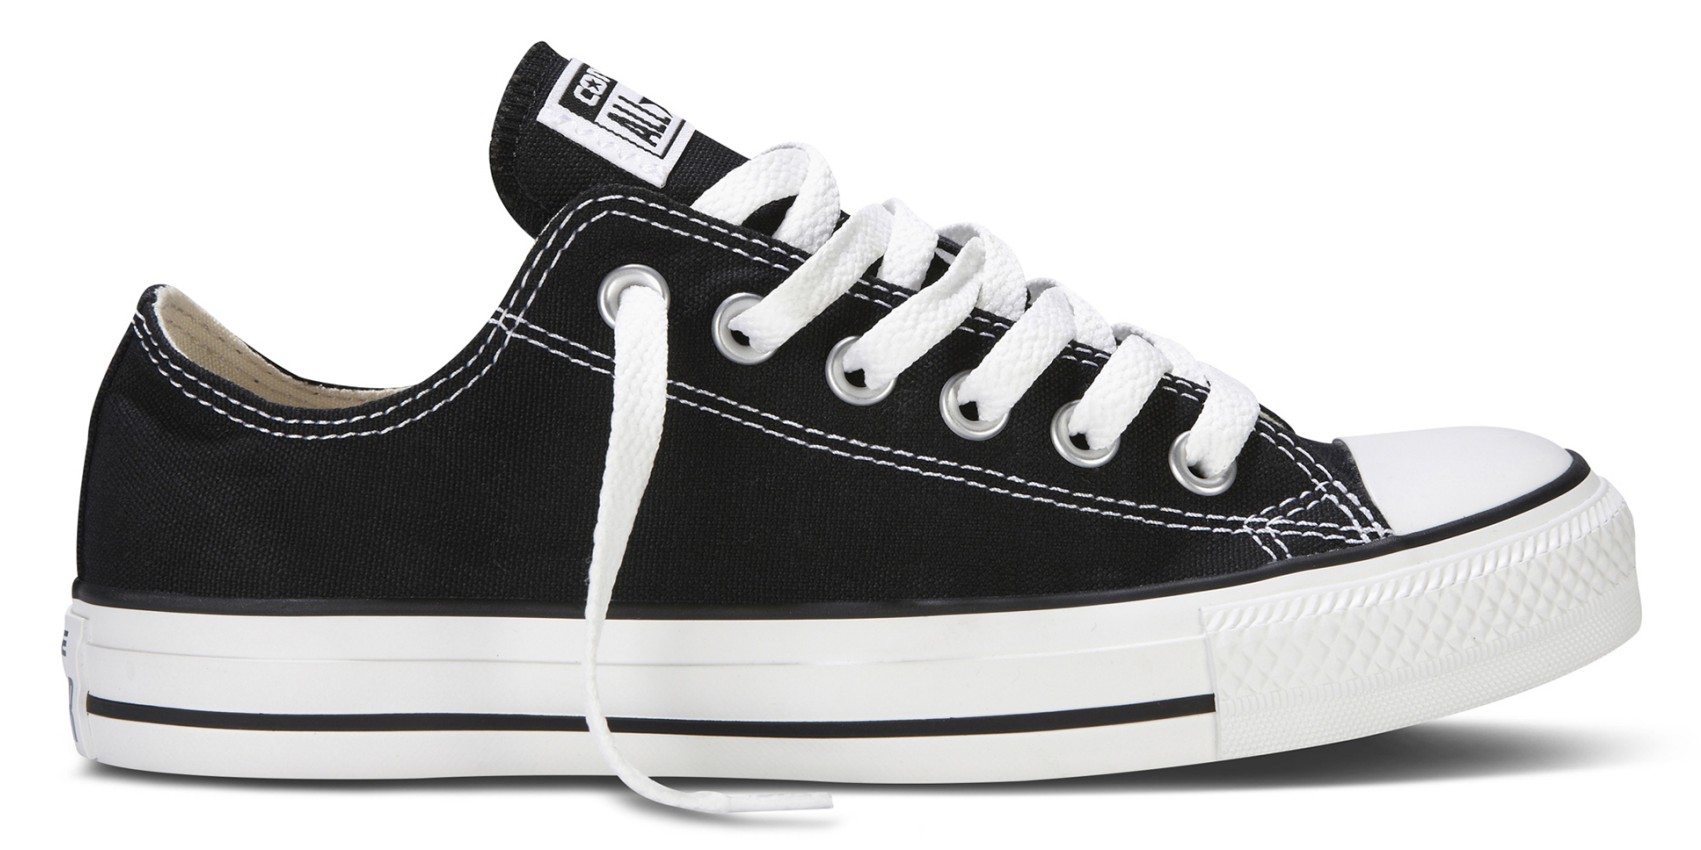 Chuchs Shoes For Sale